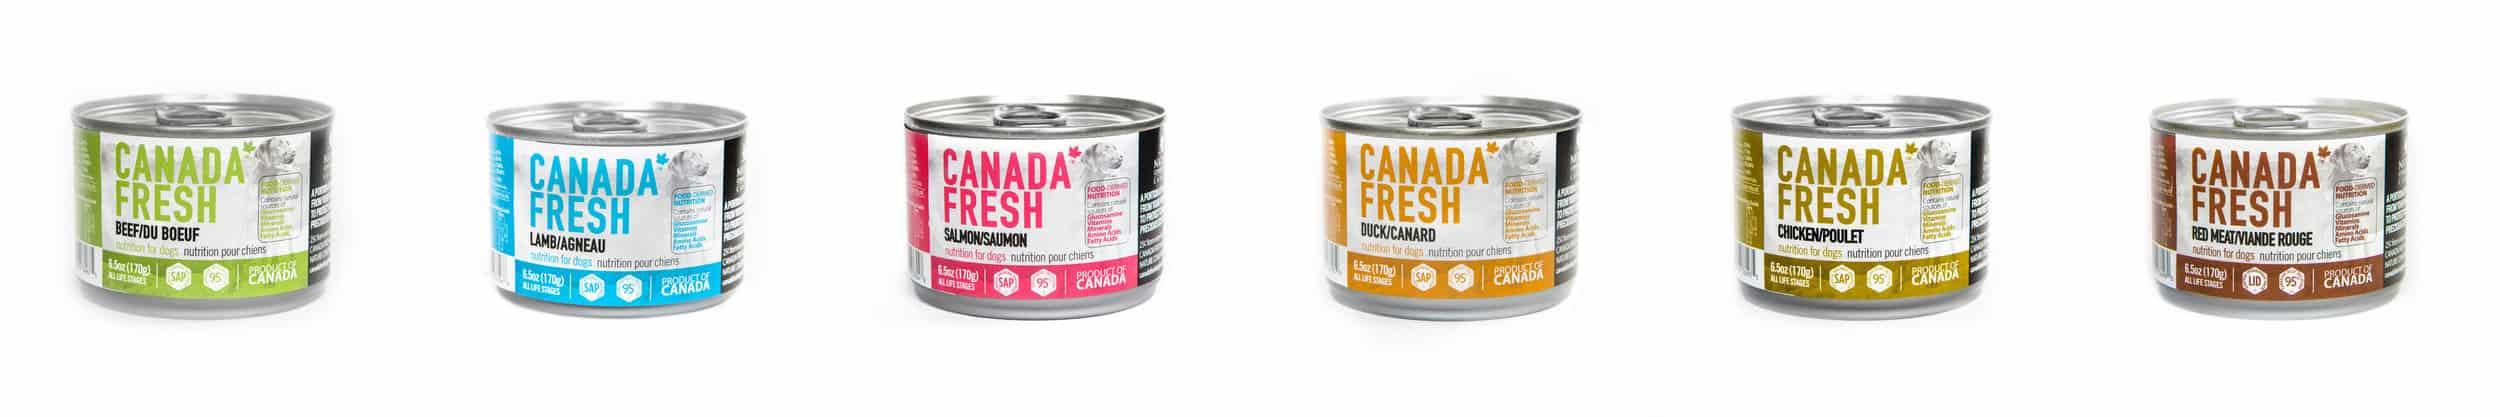 Canada Fresh Dog Food: 2021 Reviews, Recalls & Coupons 3